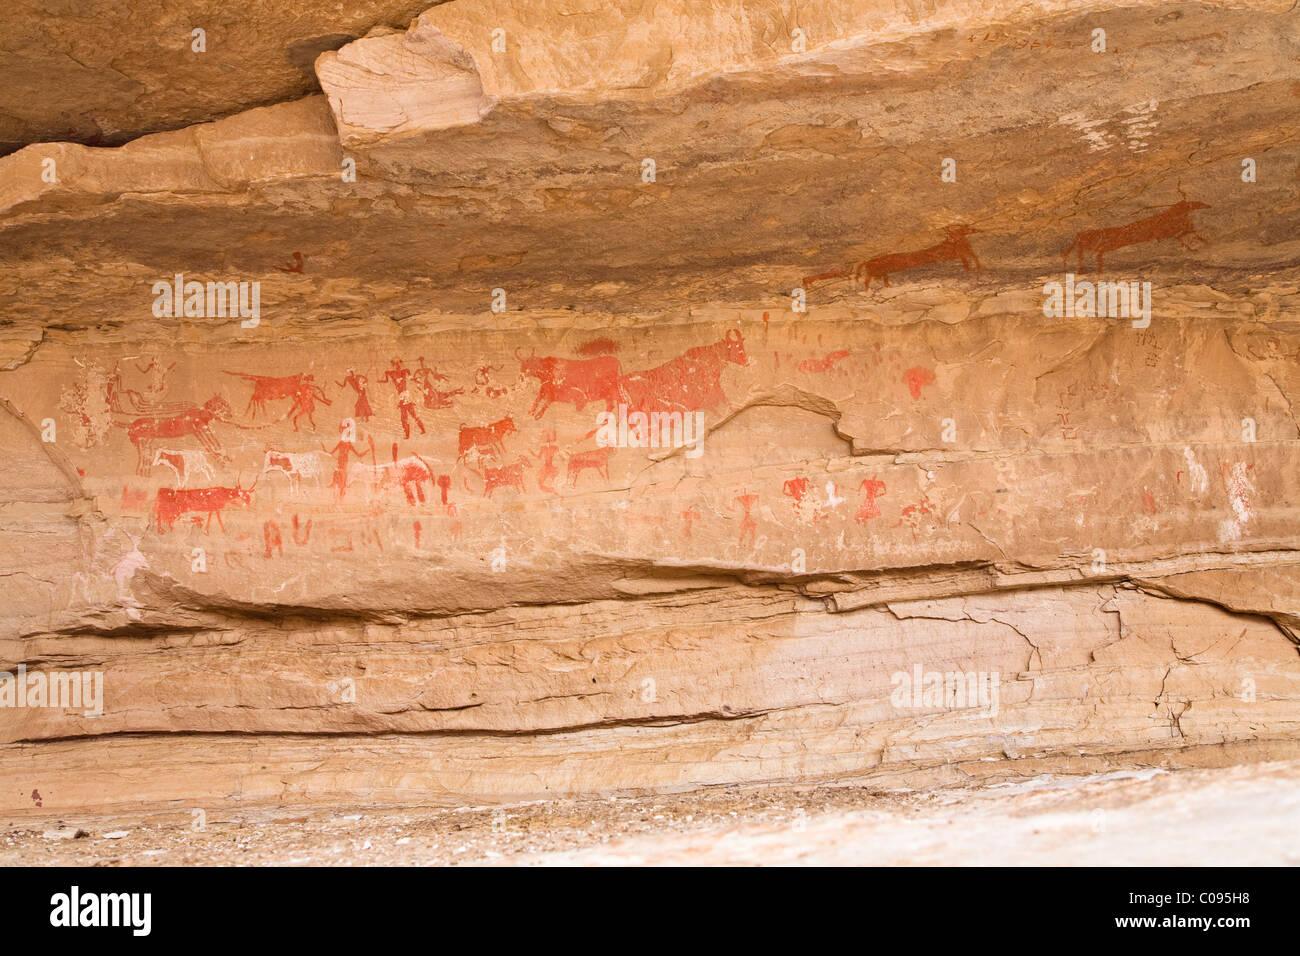 Prehistoric rock drawings in the Awis Valley, Akakus Mountains, Libyan Desert, Libya, Sahara, North Africa, Africa - Stock Image